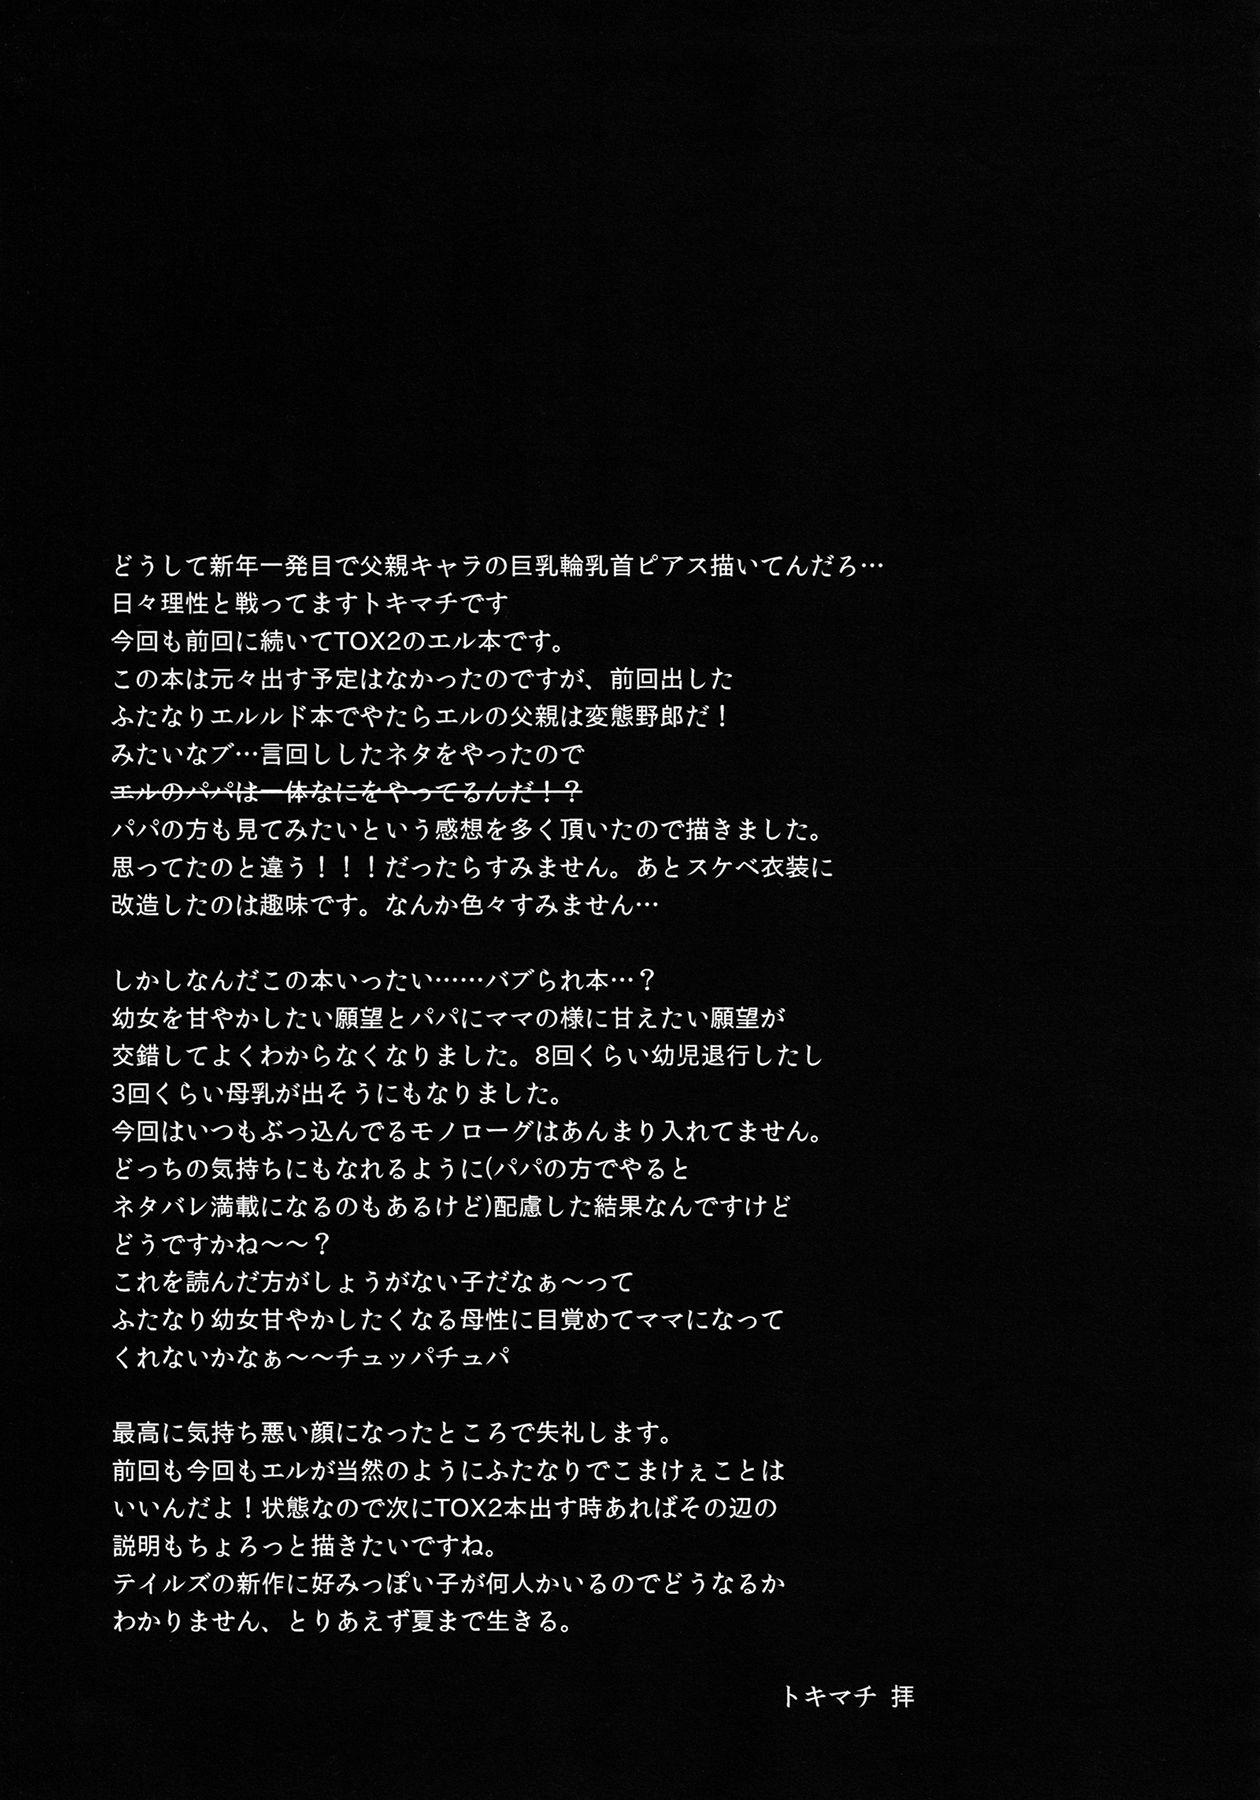 (COMIC1☆10) [Temparing (Tokimachi Eisei)] Papa ni AmaElle Futanari Manamusume | Daddy's Spoiled, BELLEoved Little (Futanari) Girl (Tales of Xillia 2) [English] [Zero Translations] 27